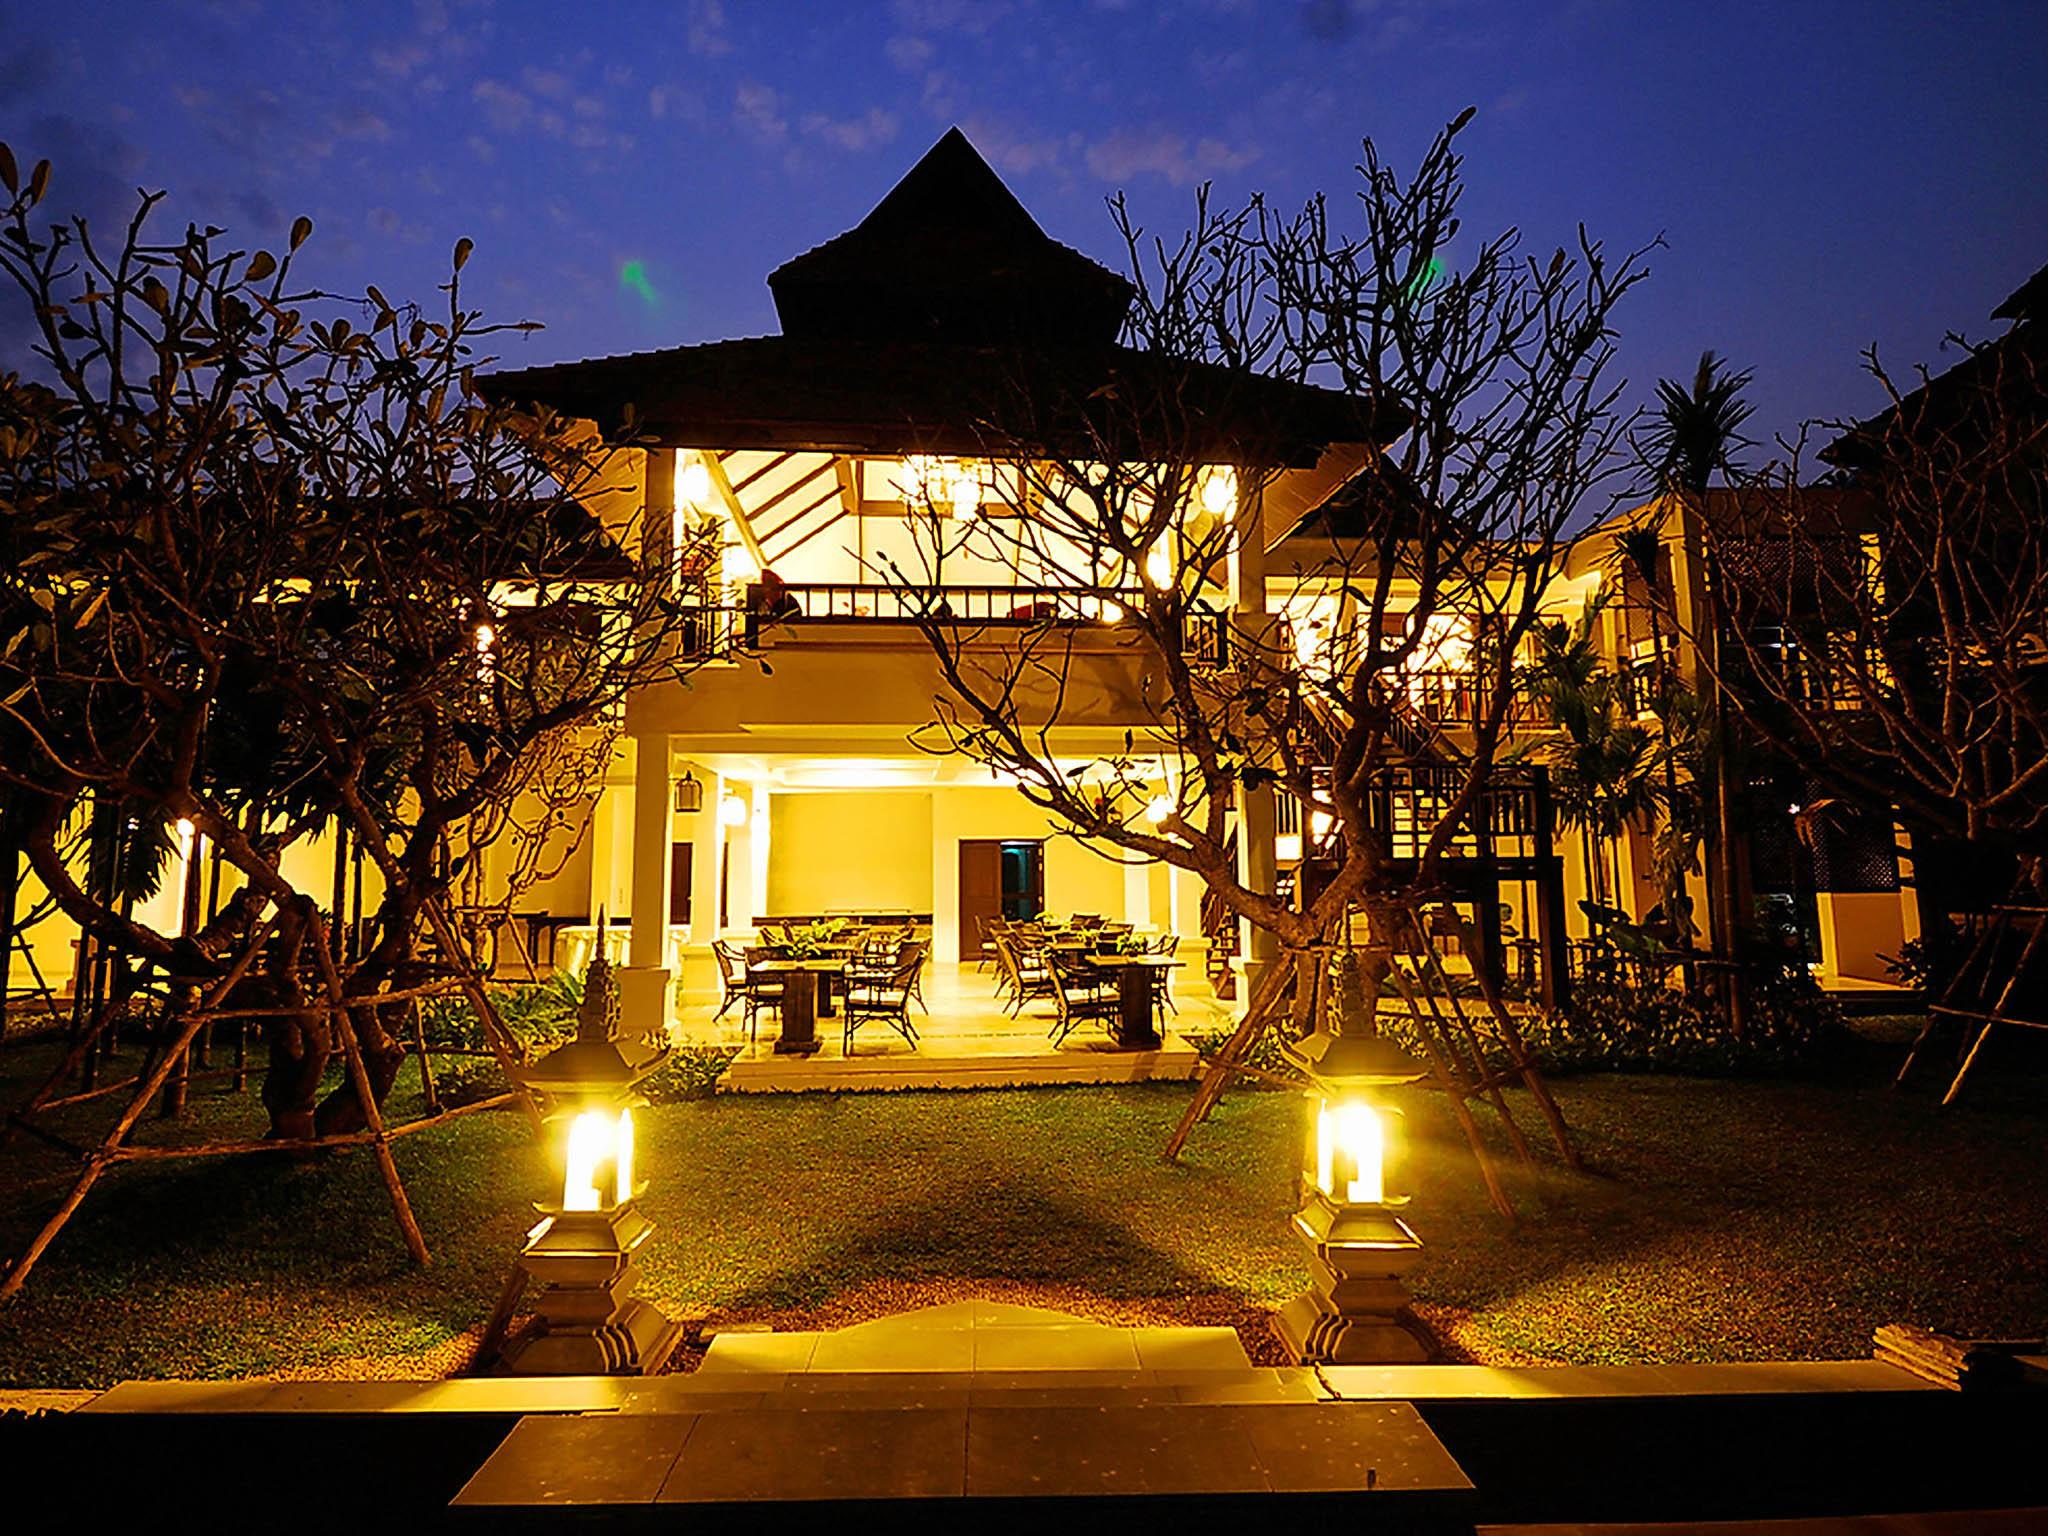 Destination bodhi serene a boutique hotel